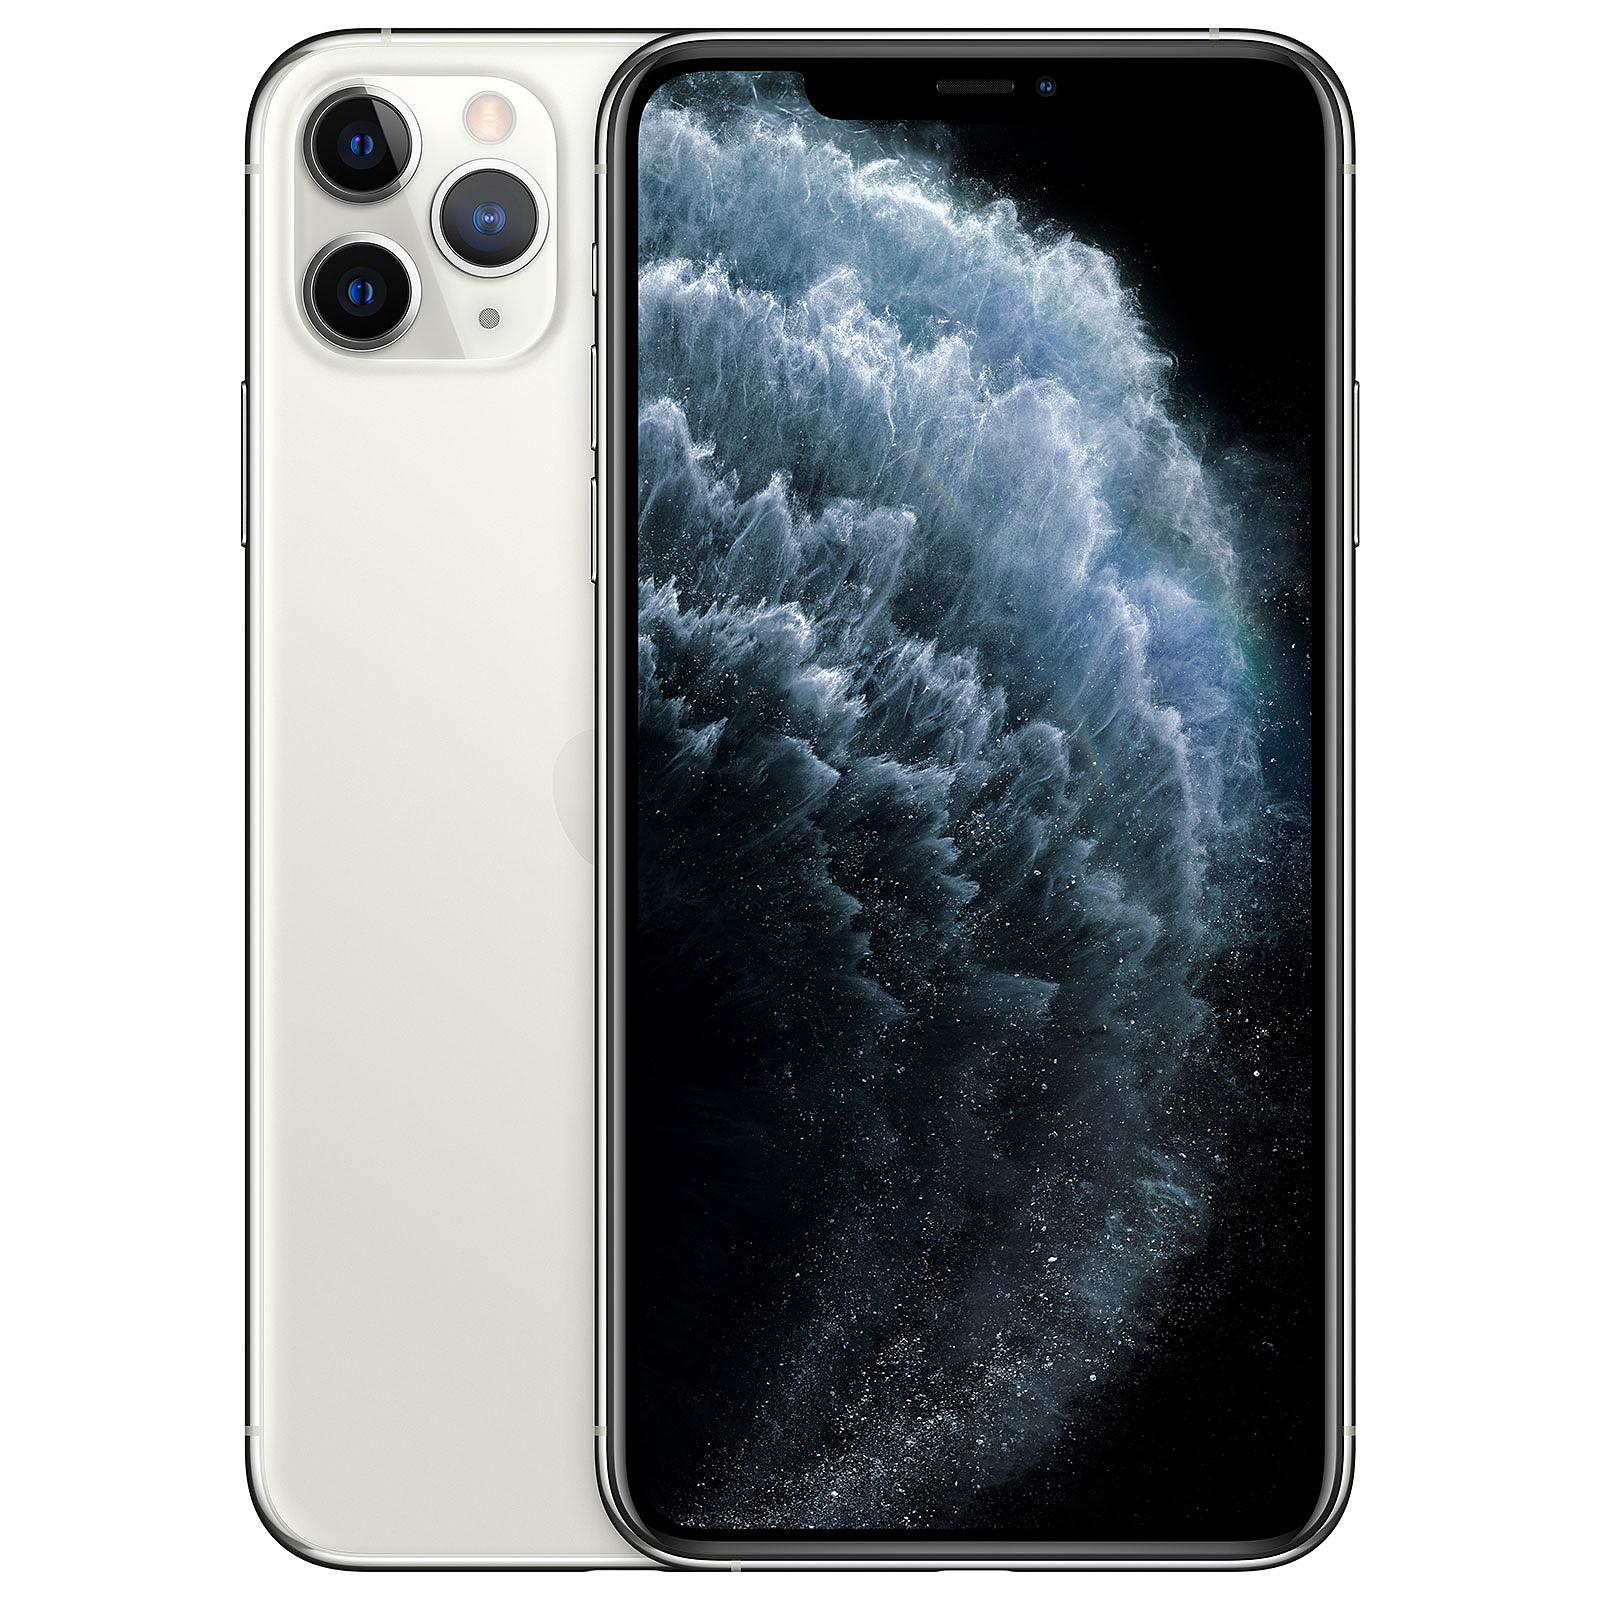 Apple iPhone 11 Pro Max 256 GB Plata